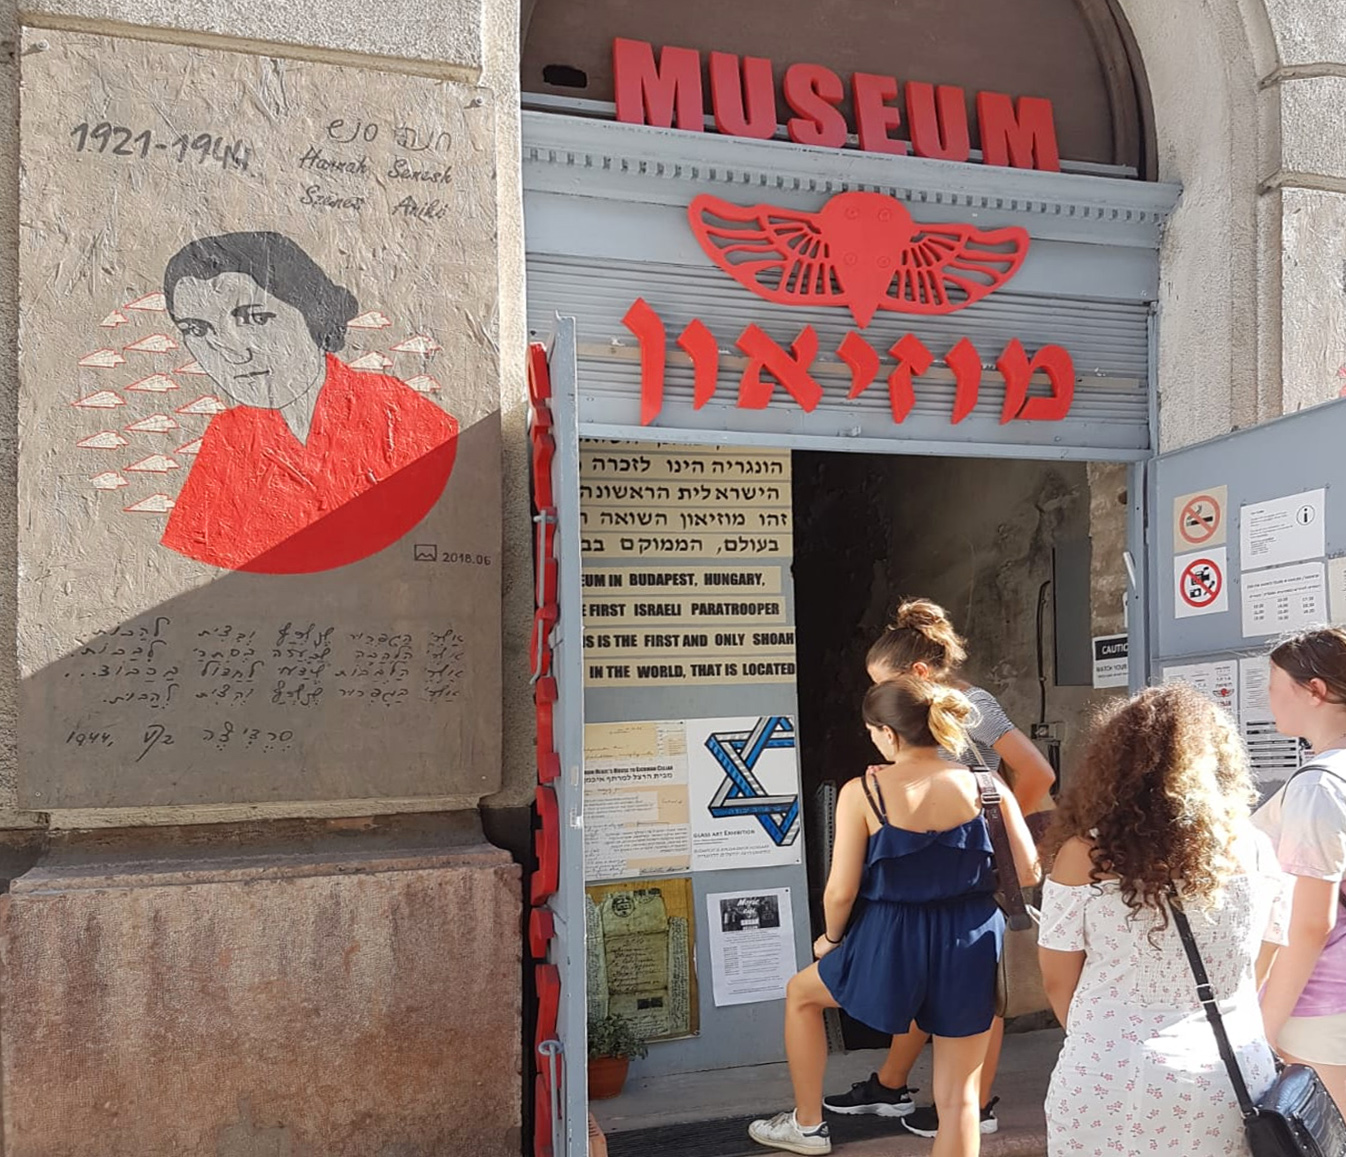 holokauszt_almuzeum_budapesten.jpg